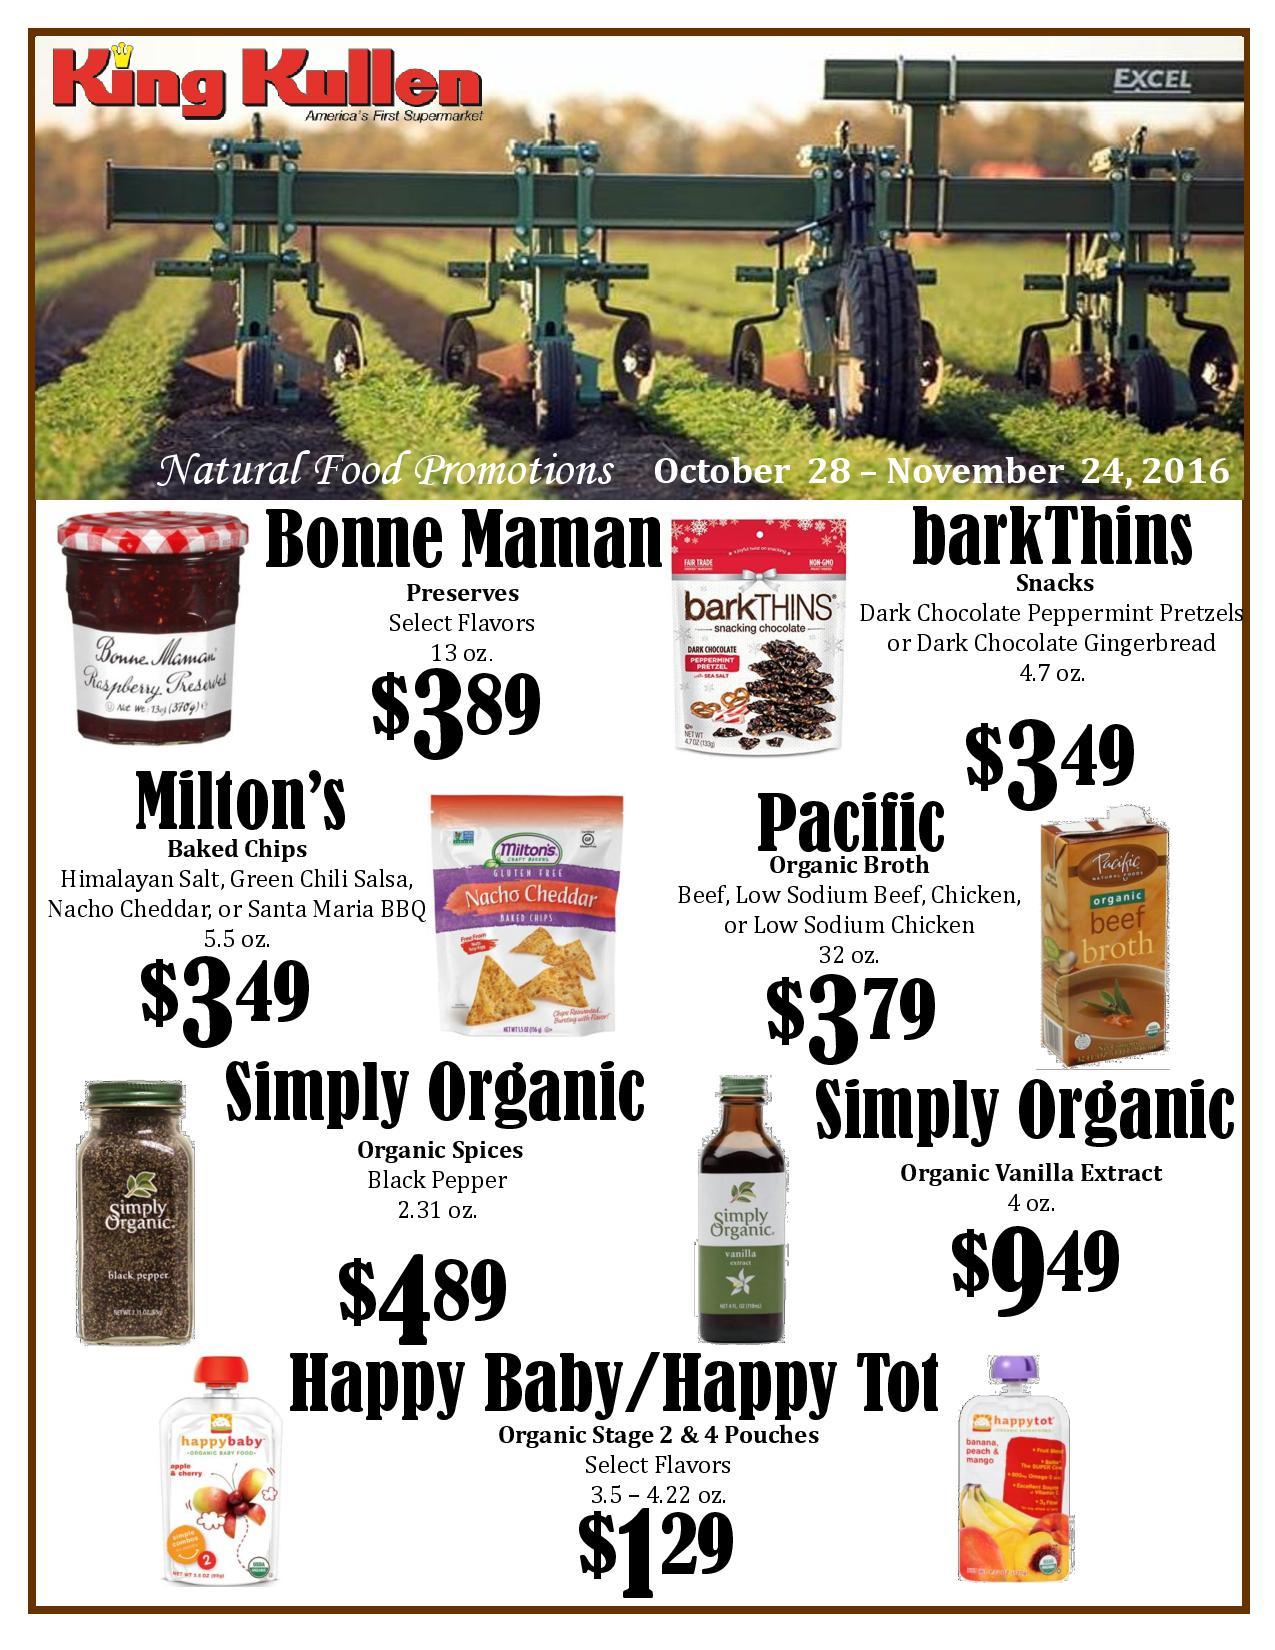 News Events King Kullen Natural Food Promotions King Kullen